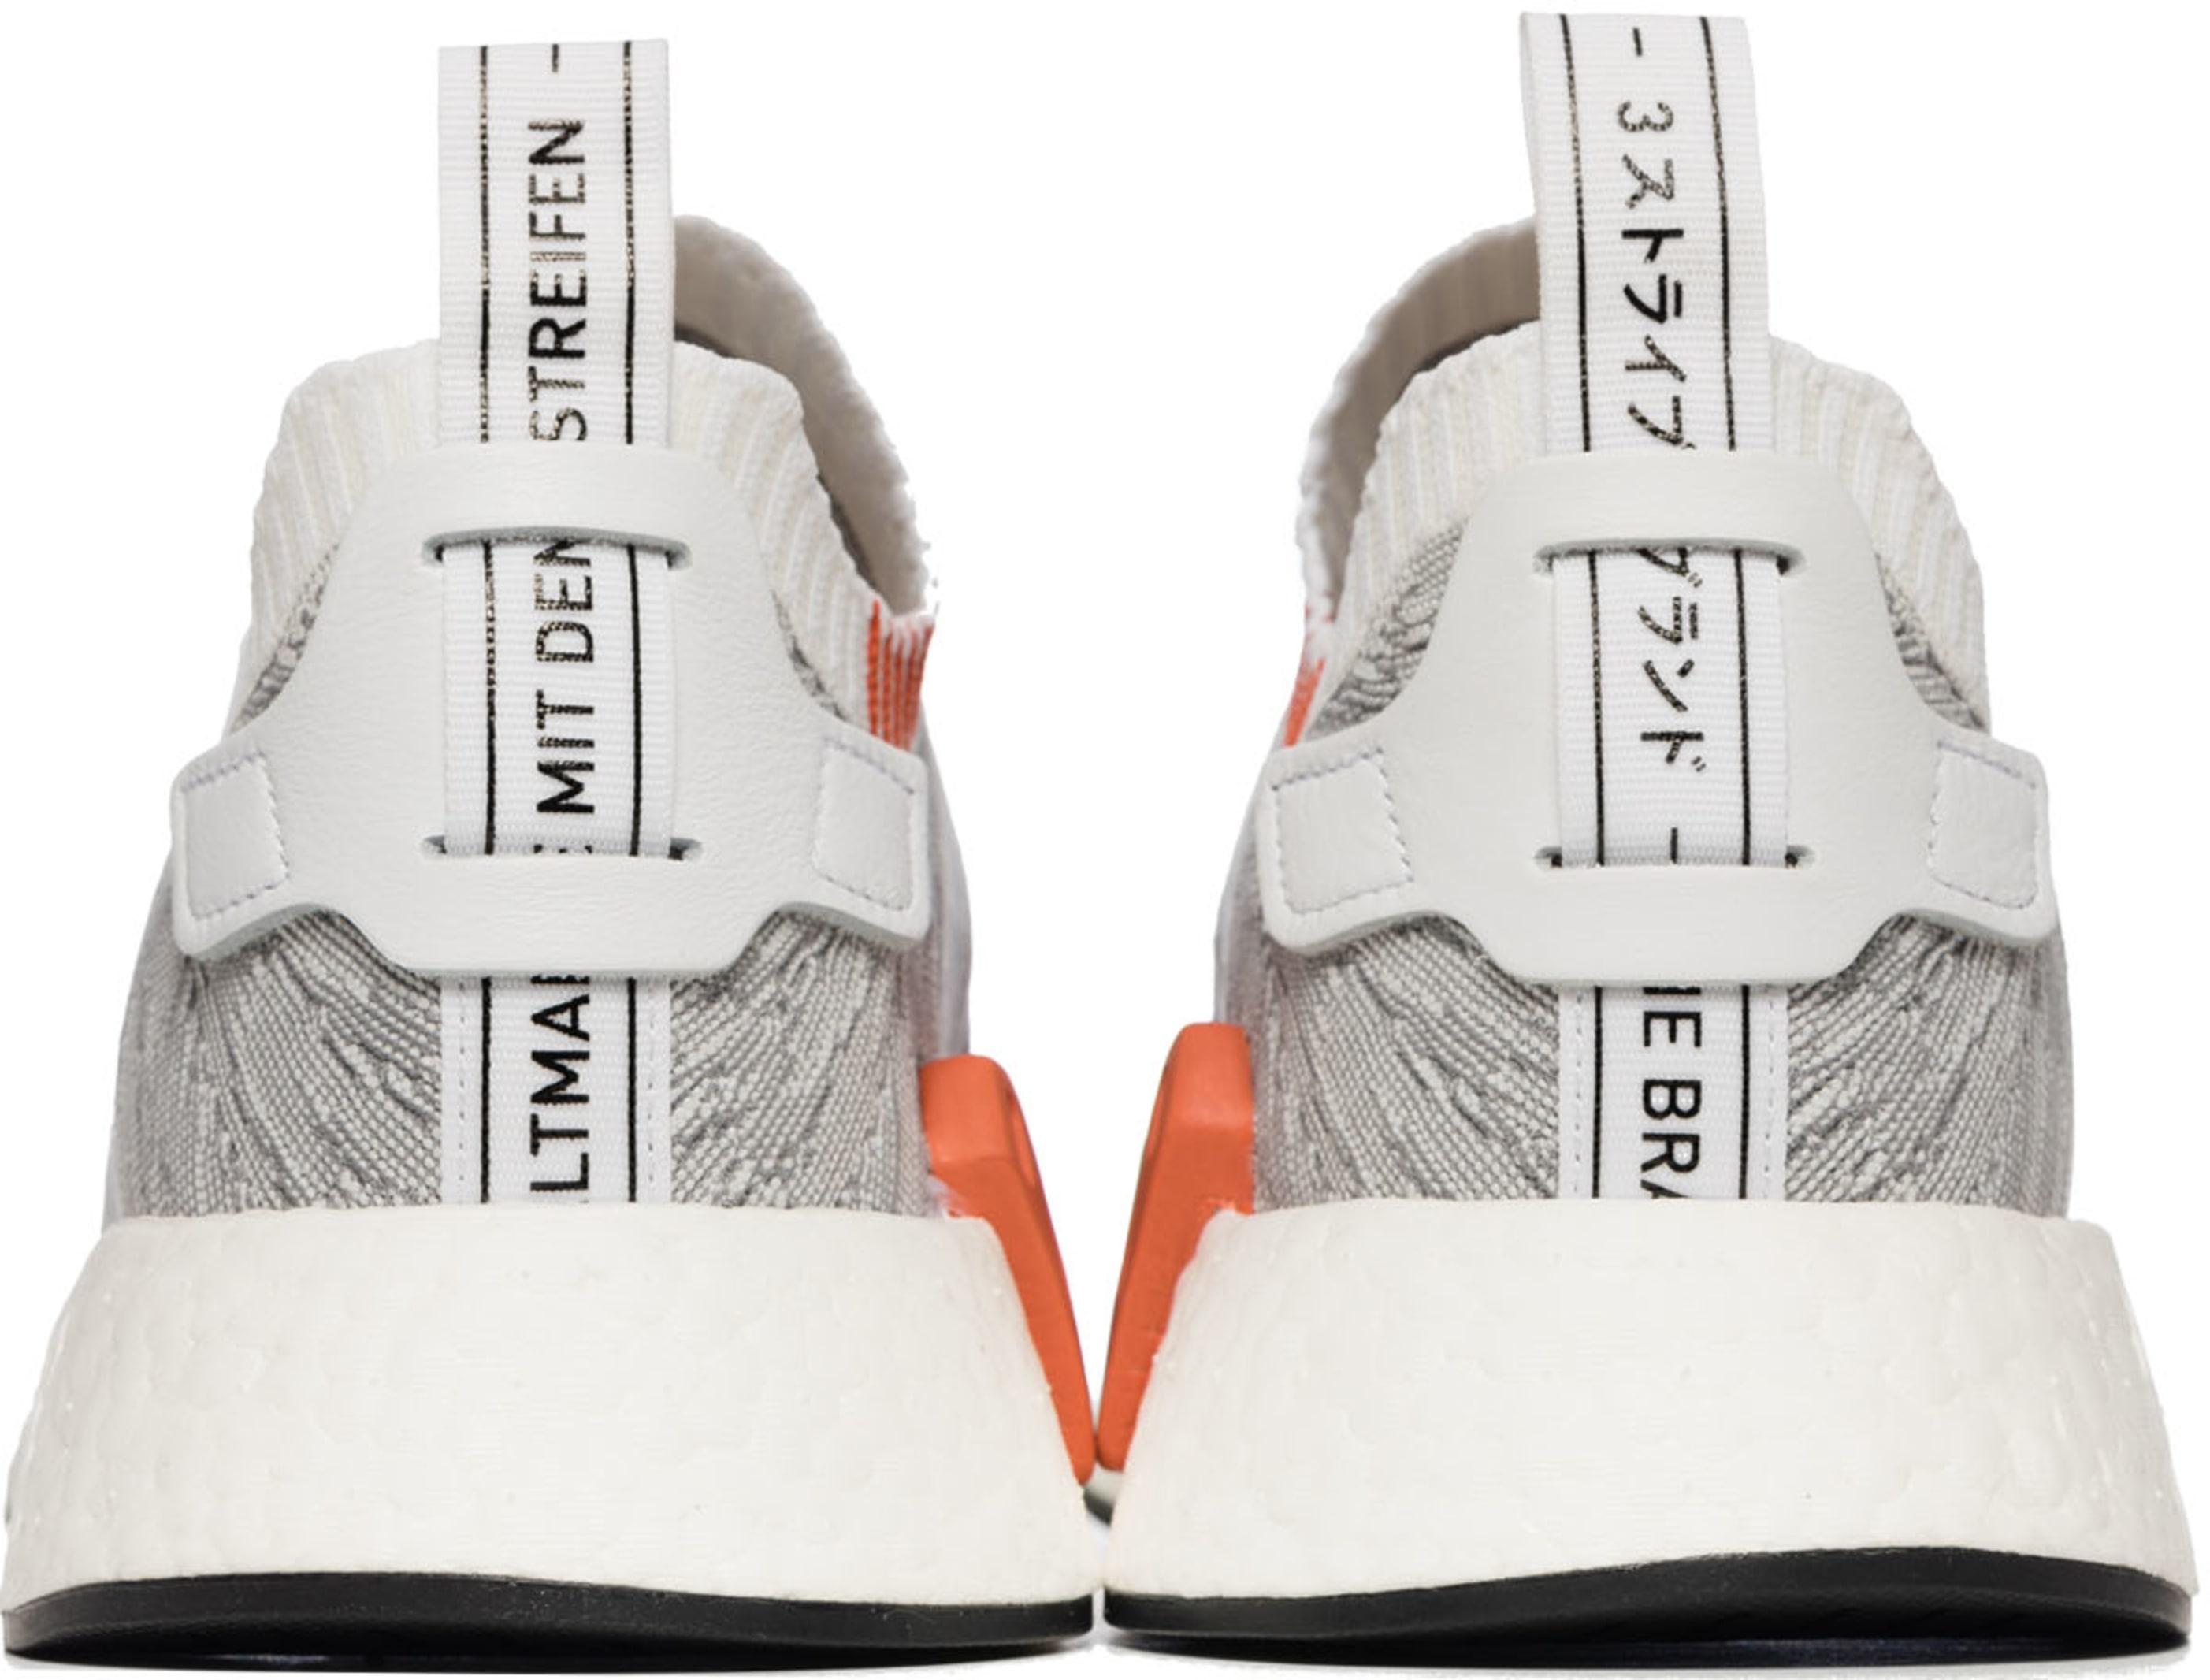 Adidas Originals Nmd R2 Primeknit Grey Footwear White Core Black Future Harvest Influenceu